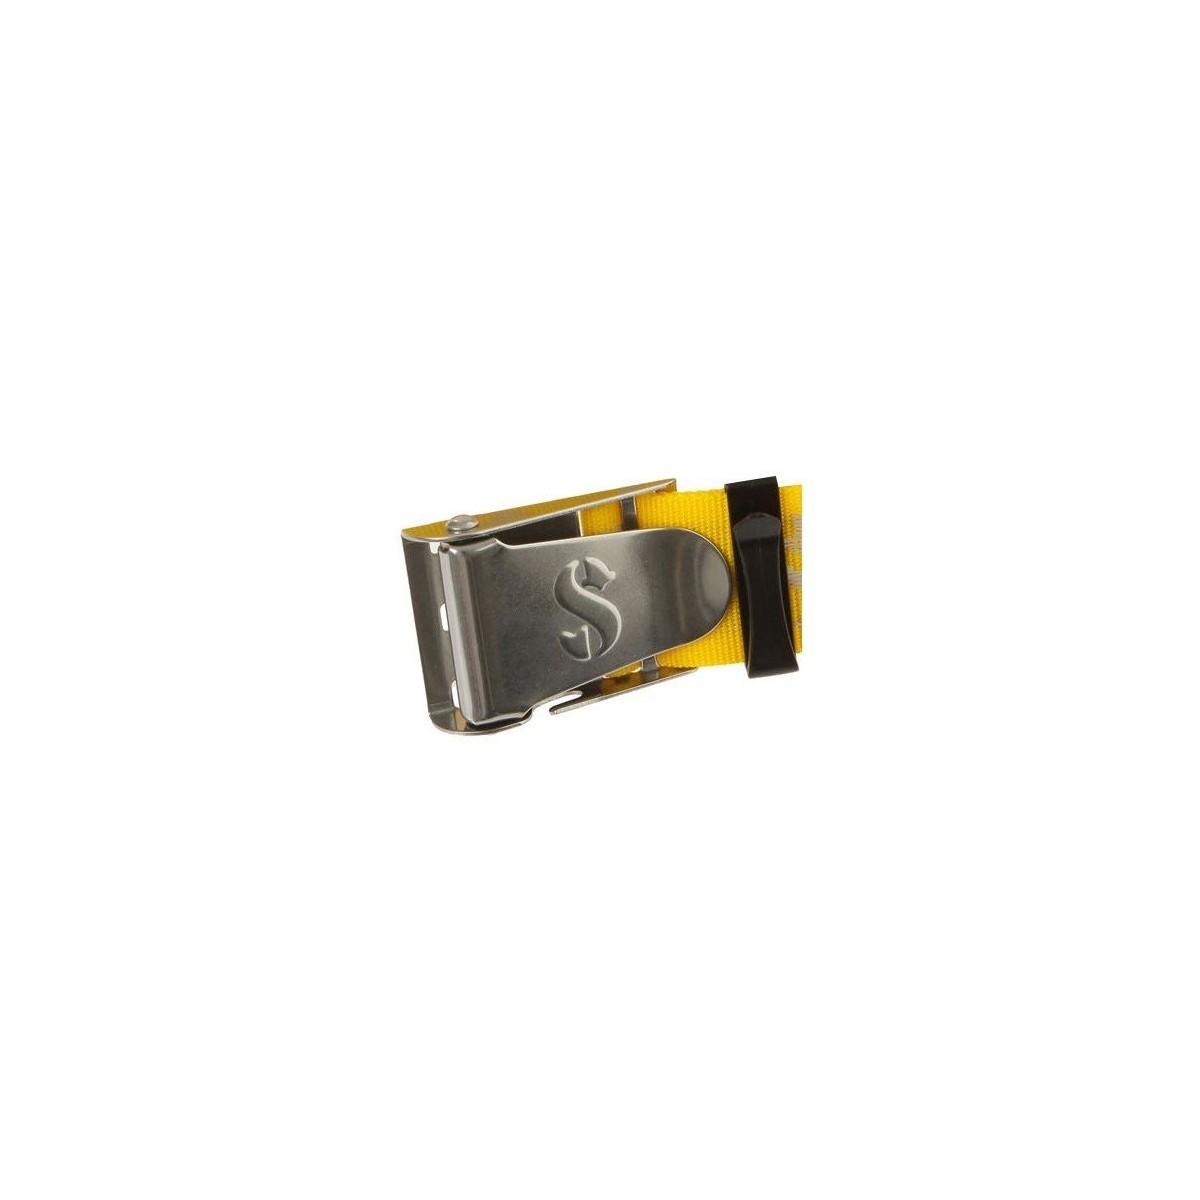 Scubapro Metal Weight Belt Buckle